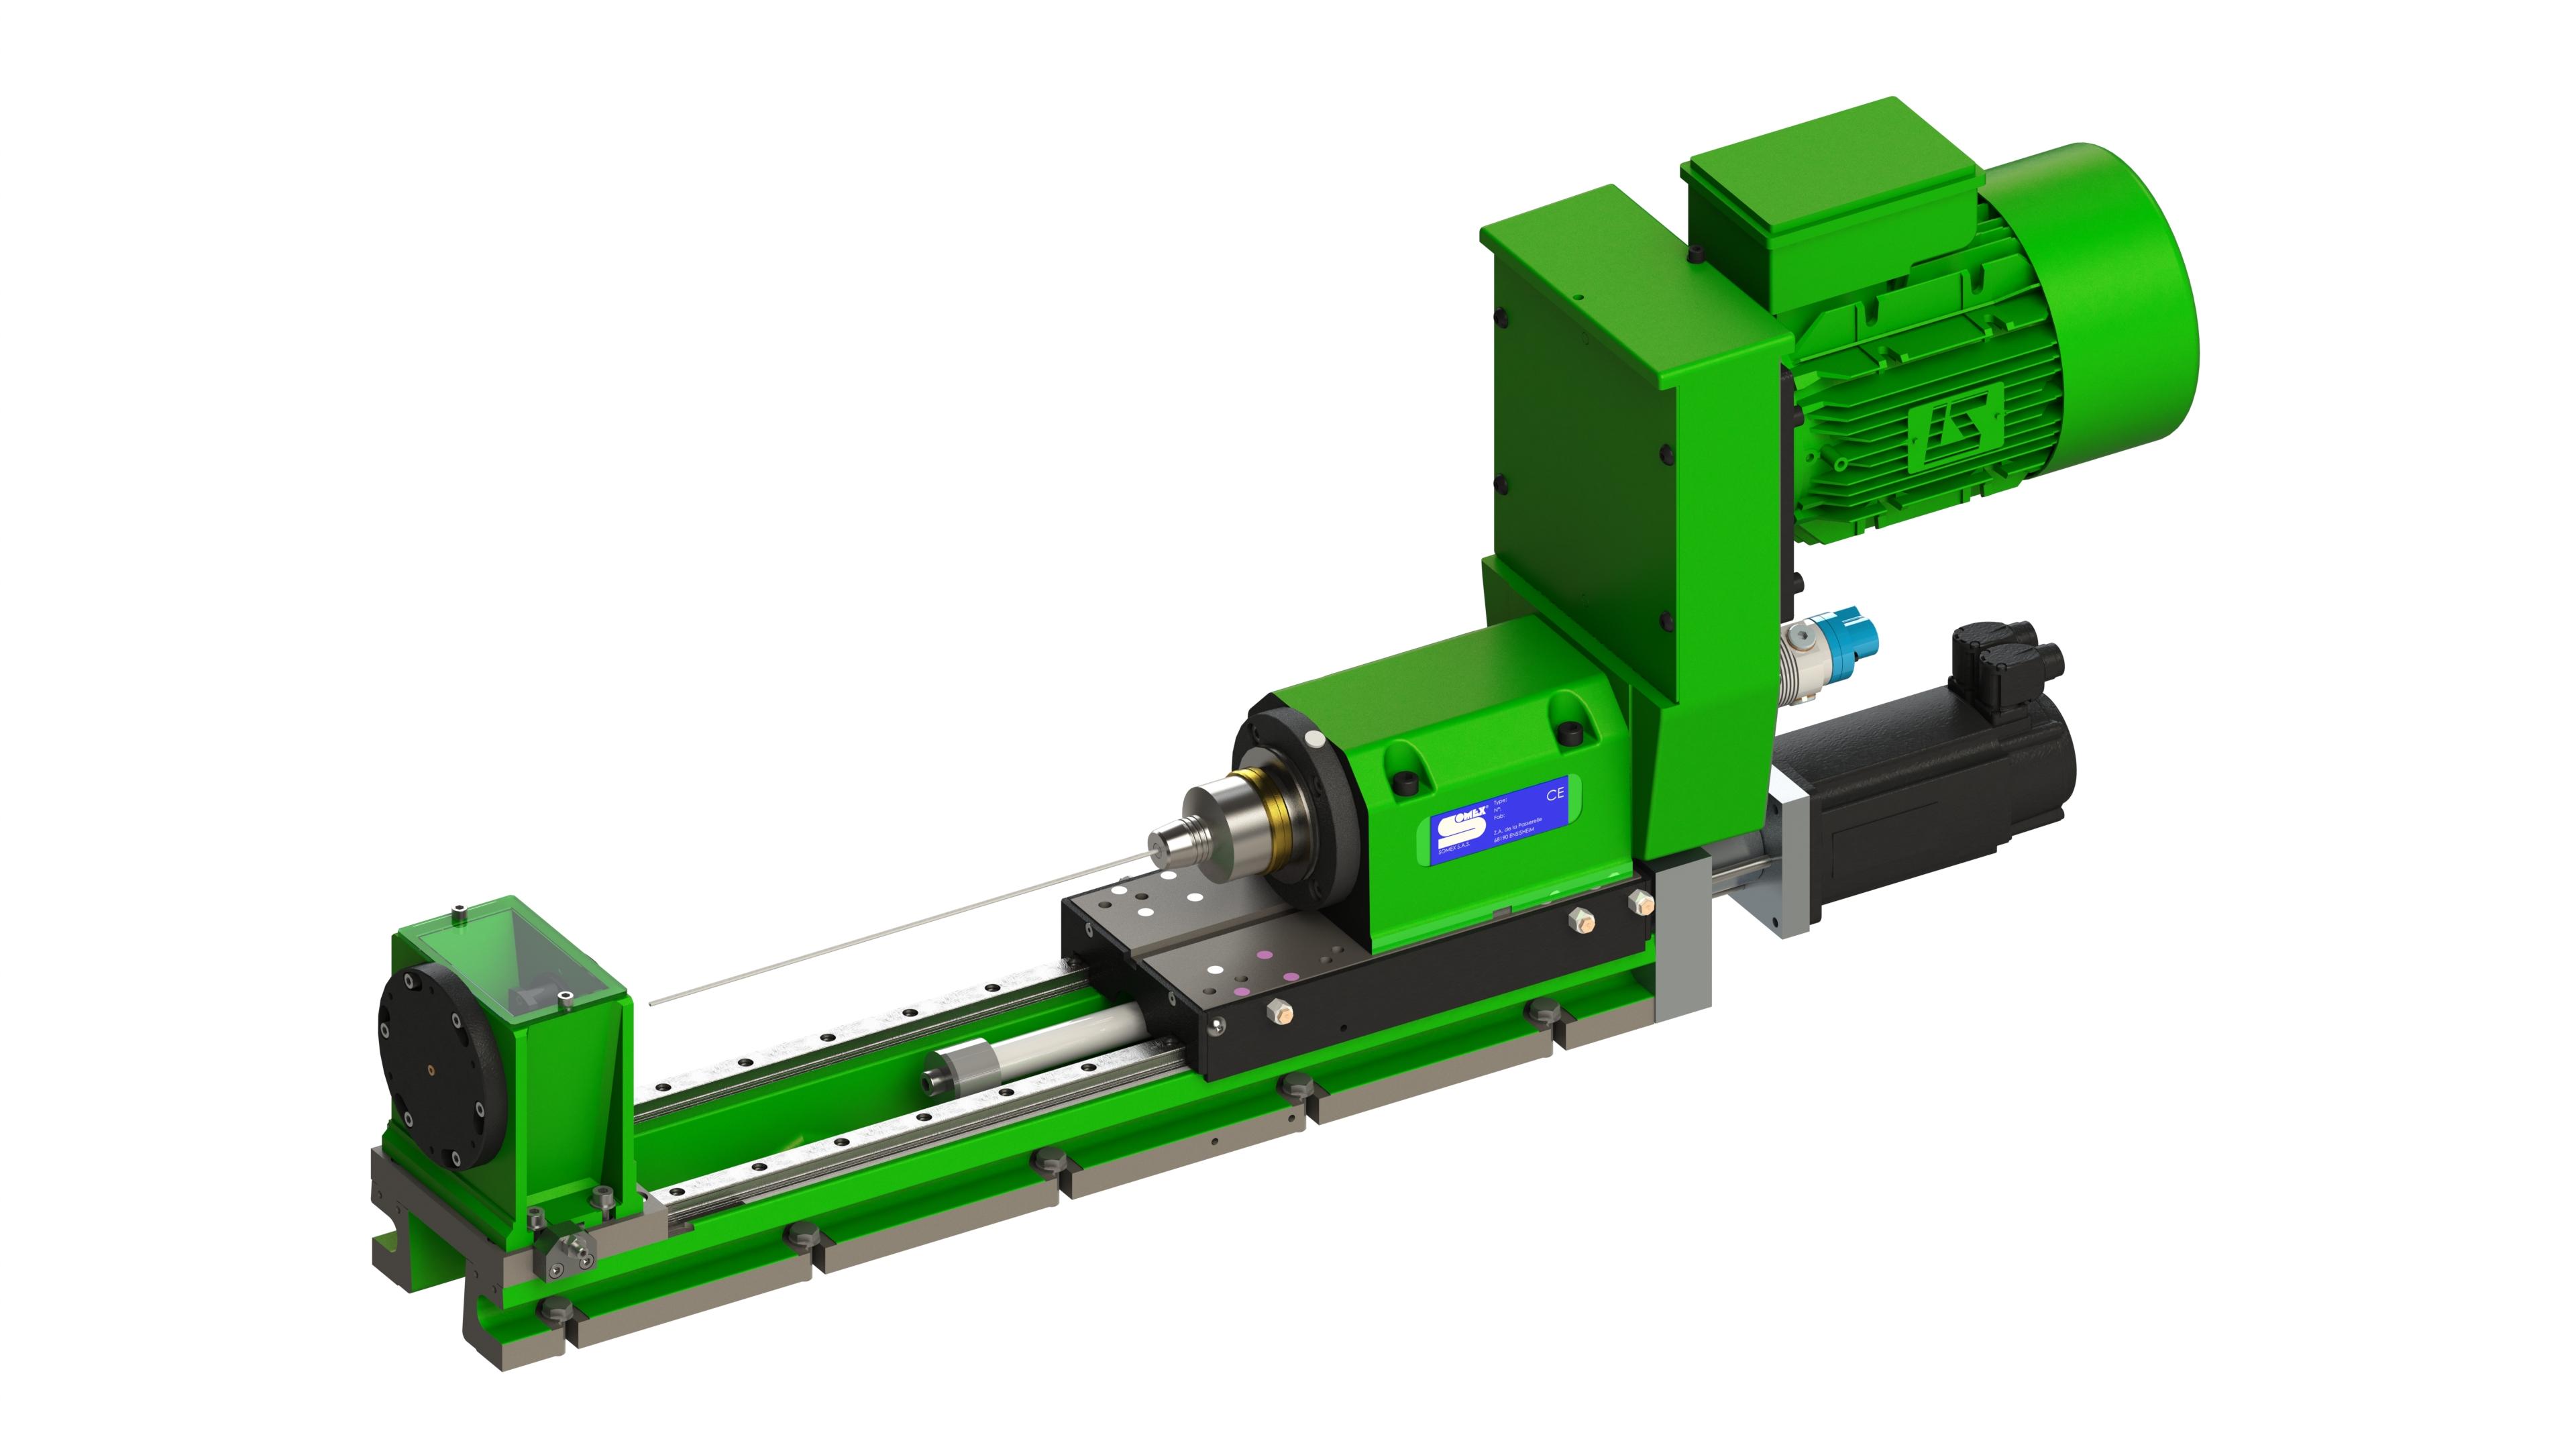 ECPP40-200  - Unité de perçage profond, capacité de perçage de Ø3 à Ø5 mm